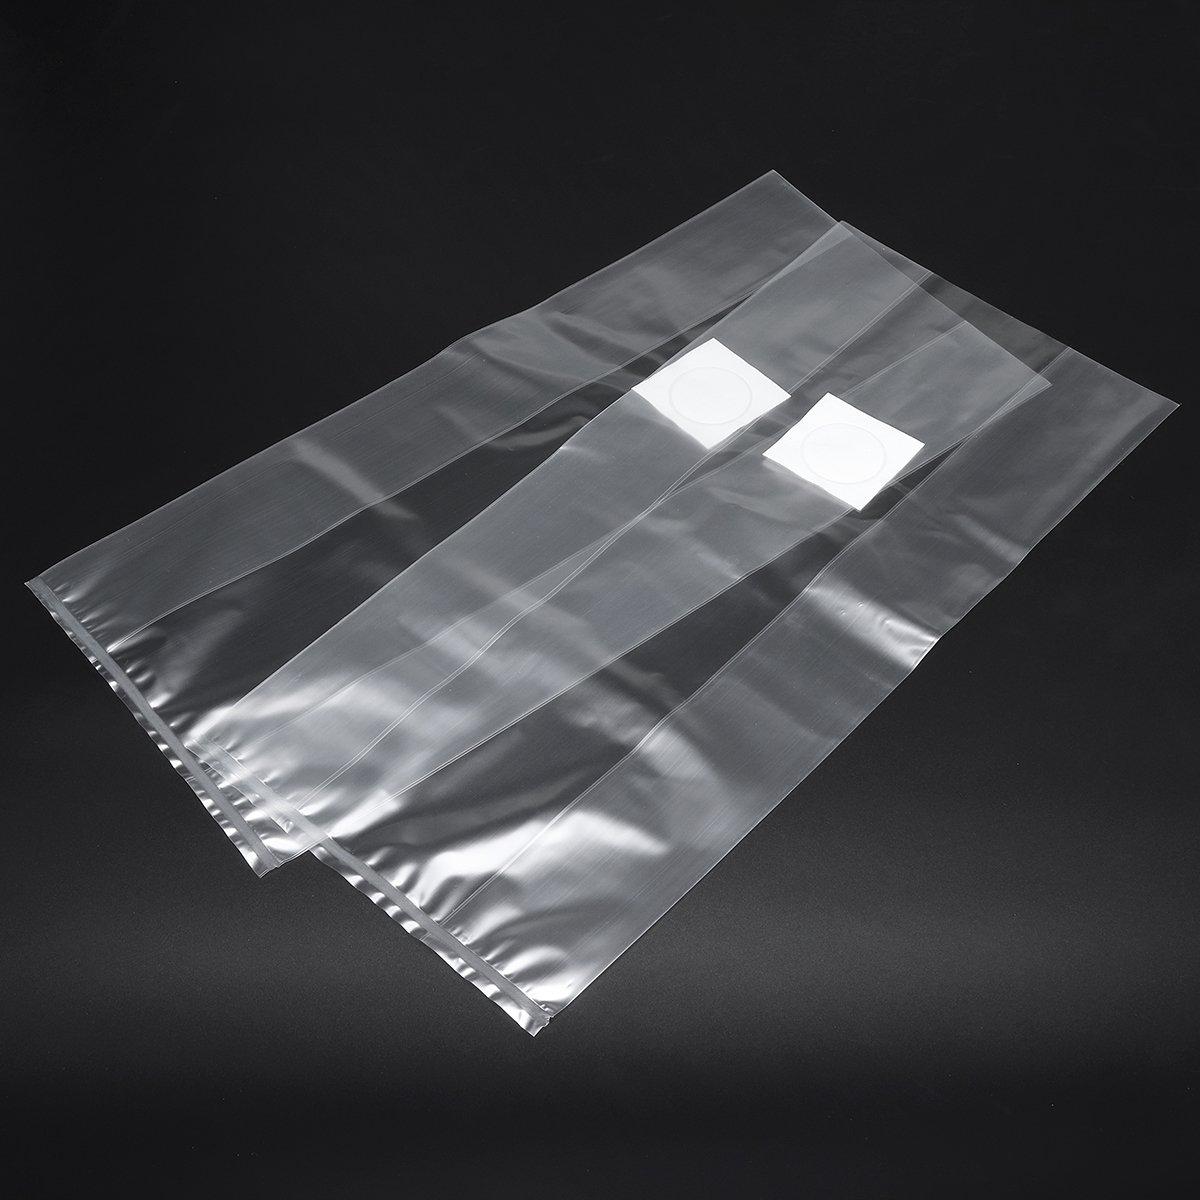 50Pcs 200x450x0.06mm PVC Mushroom Grow Seedling Bags Substrate High Temp Pre Sealable Lovinn